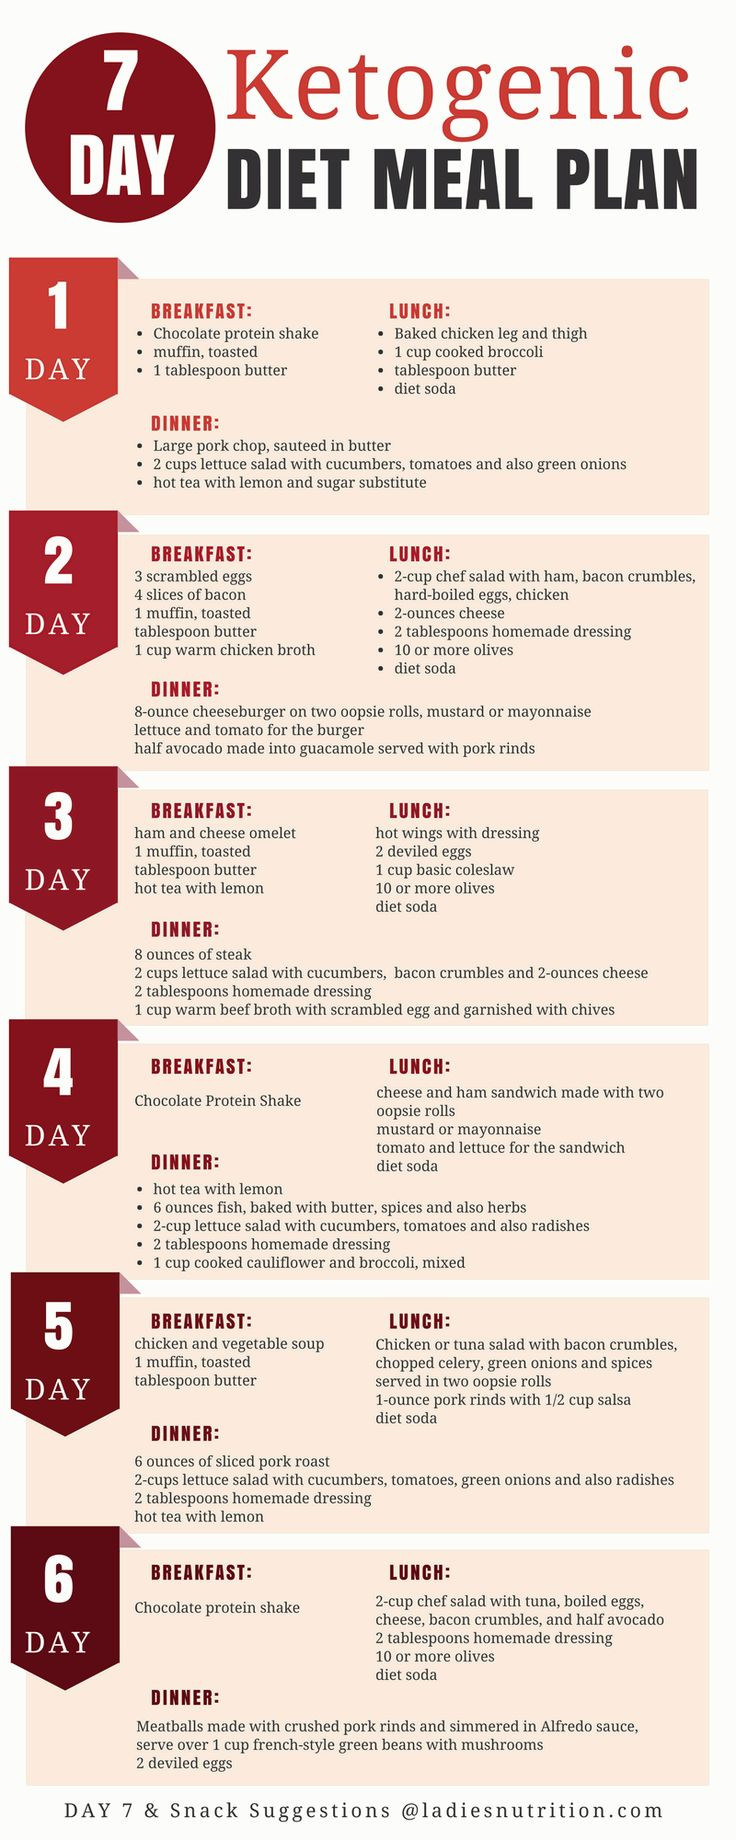 Female Keto Diet Plan Pdf  Best 25 Ketogenic t ideas on Pinterest